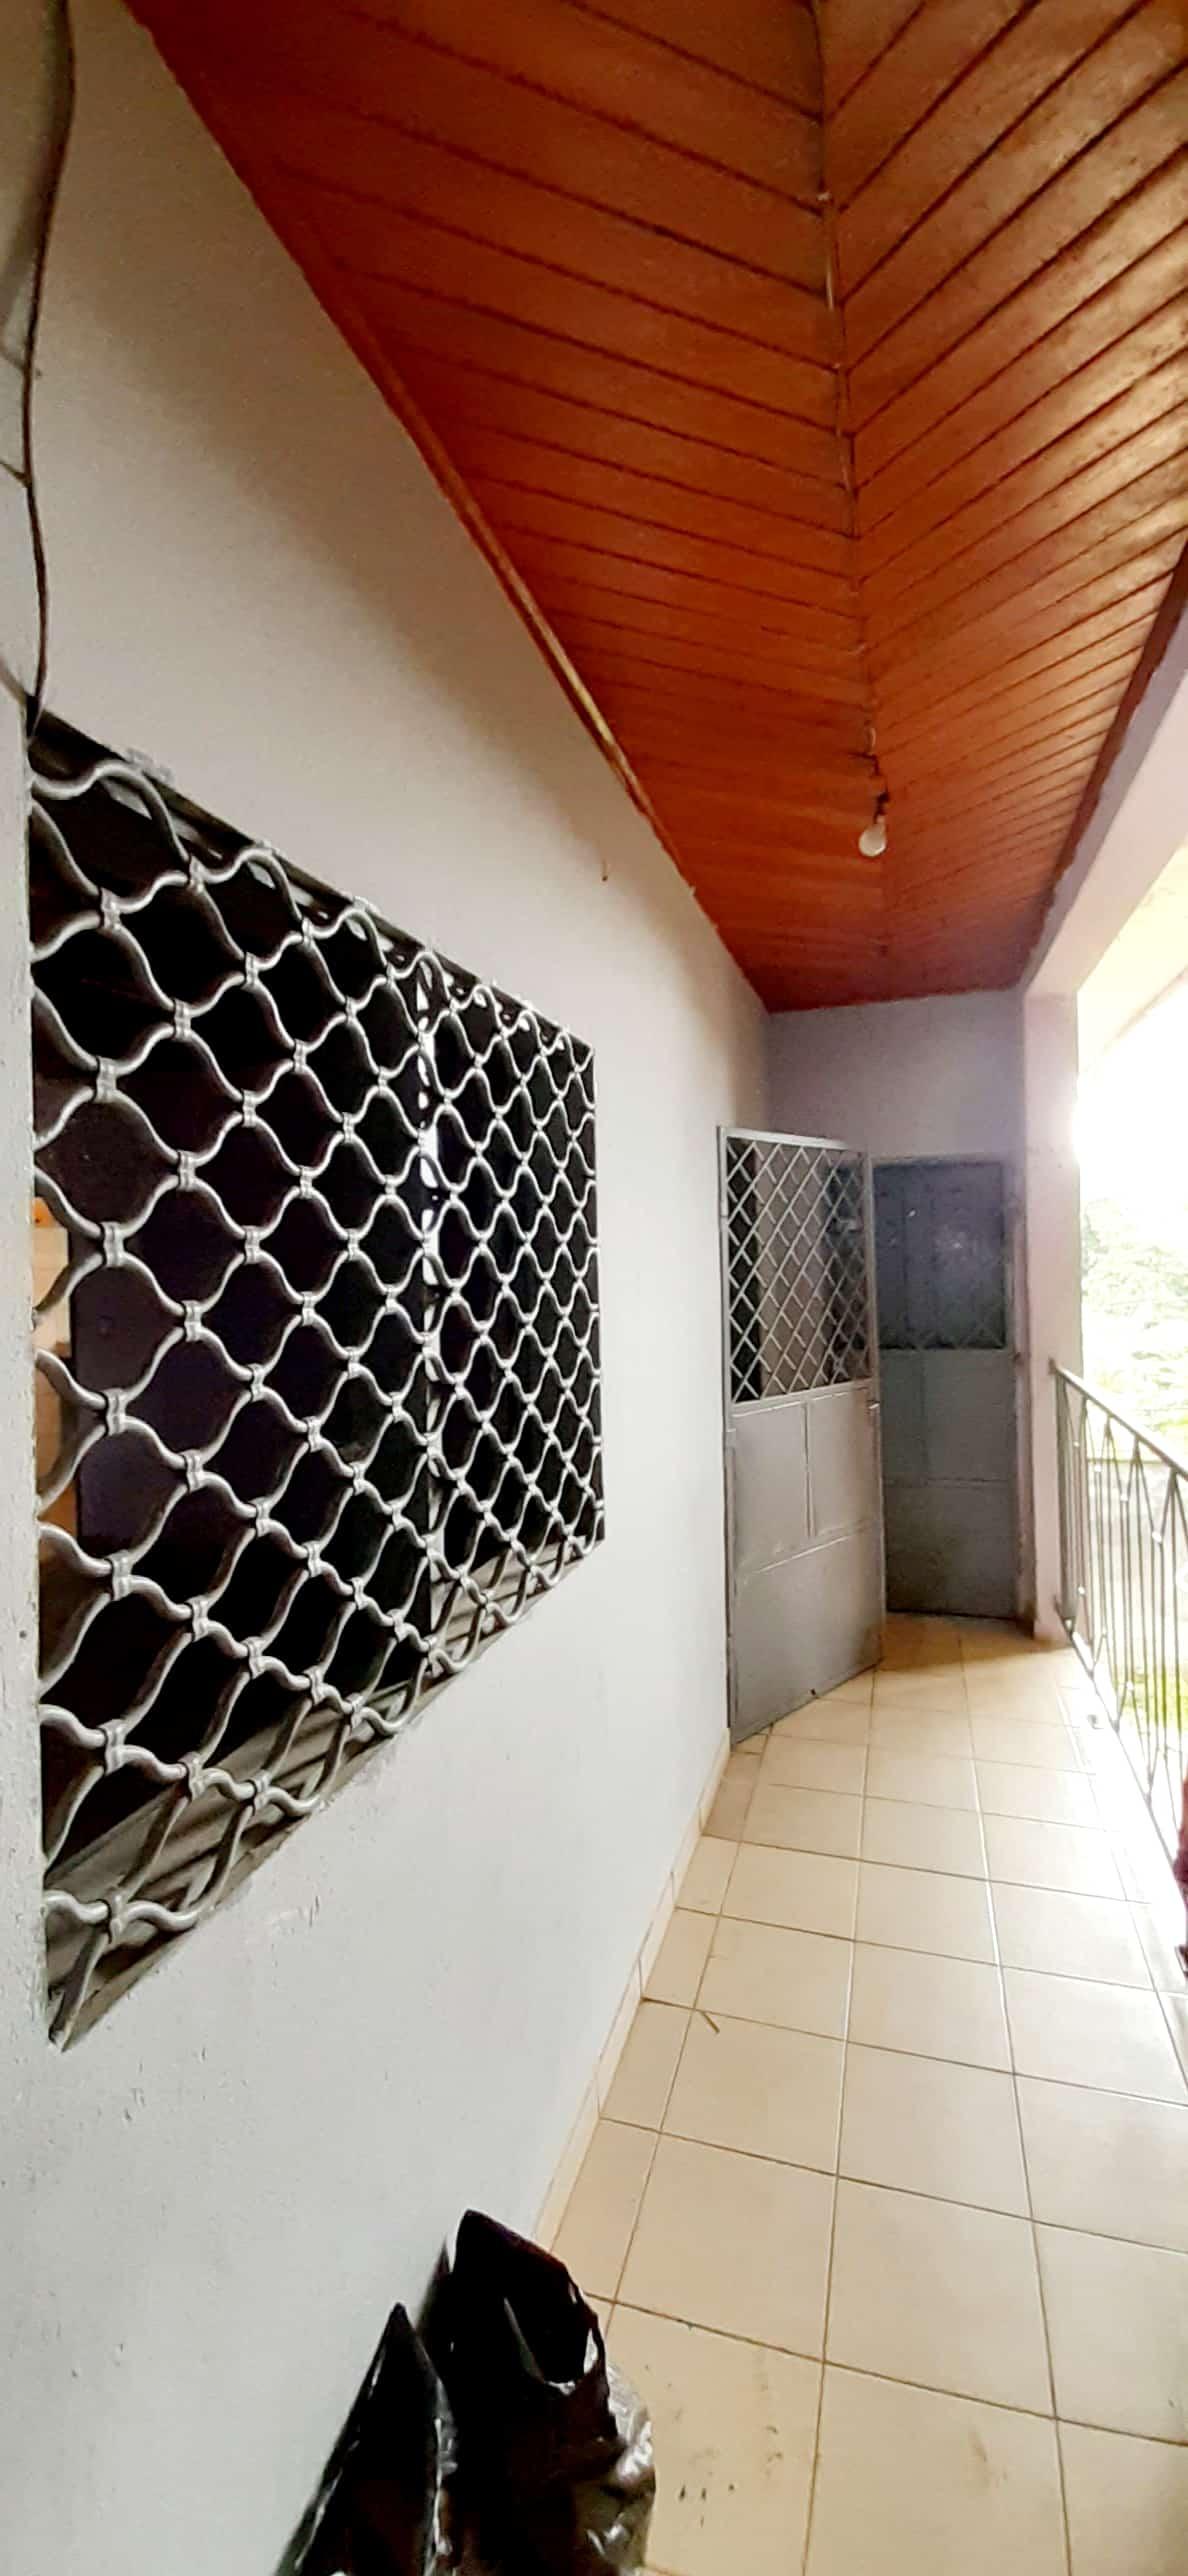 Apartment to rent - Douala, Kotto, Kotto Nbangue - 1 living room(s), 2 bedroom(s), 1 bathroom(s) - 75 000 FCFA / month